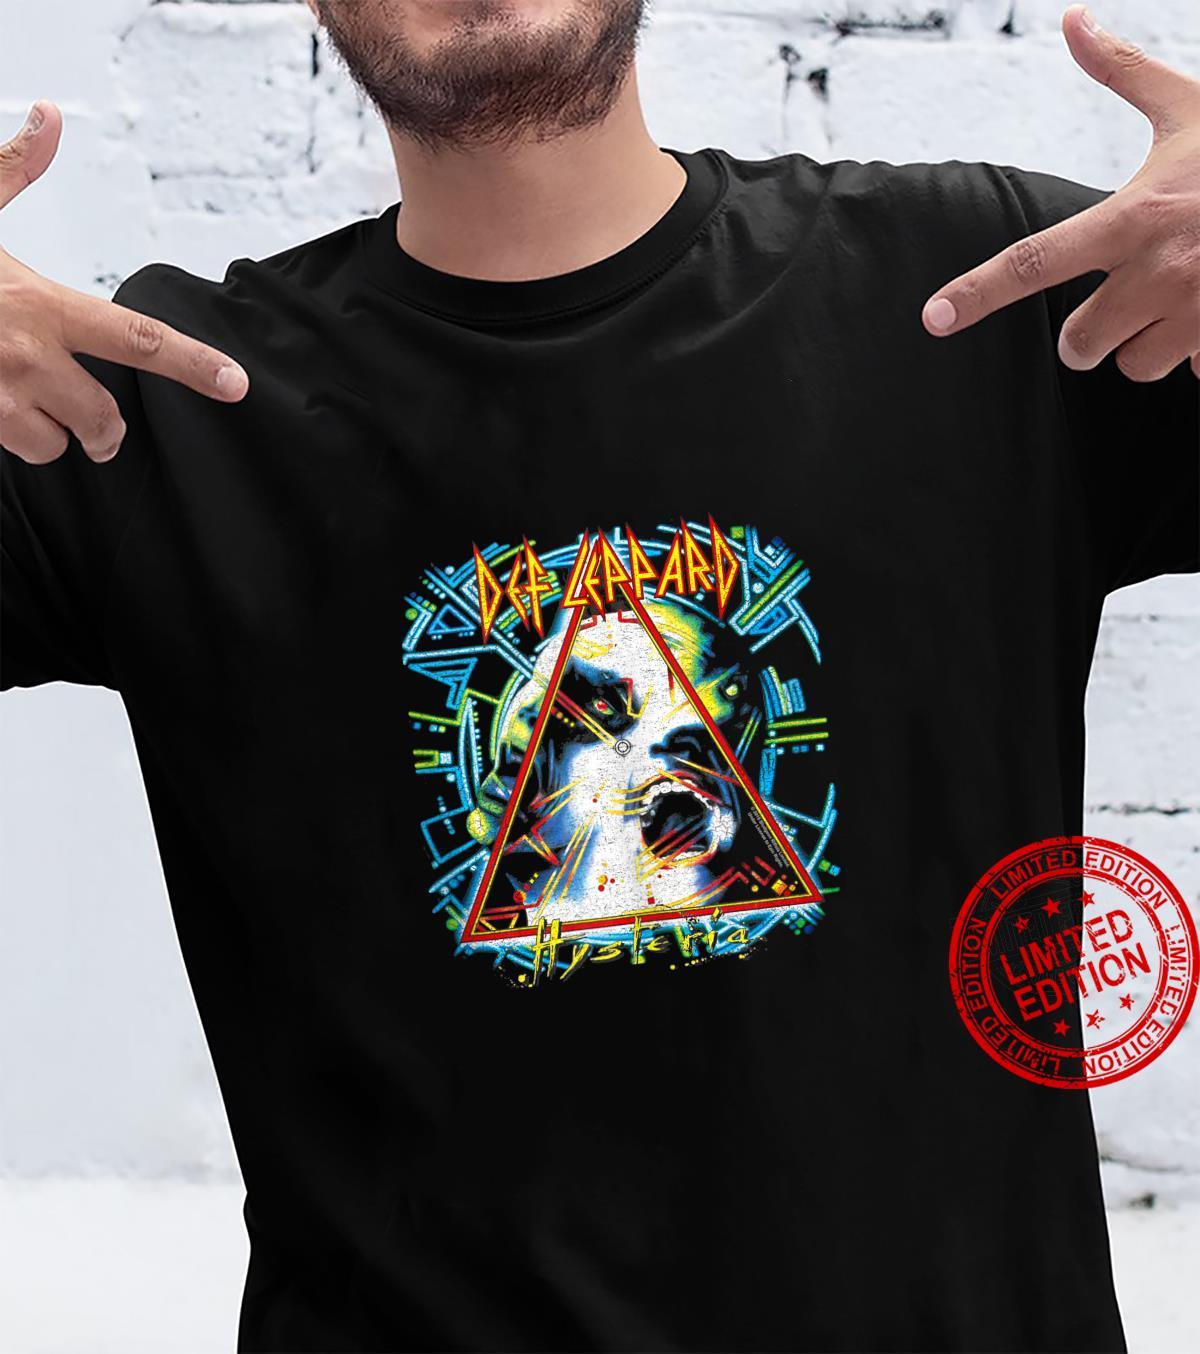 Def Leppard Hysteria Shirt